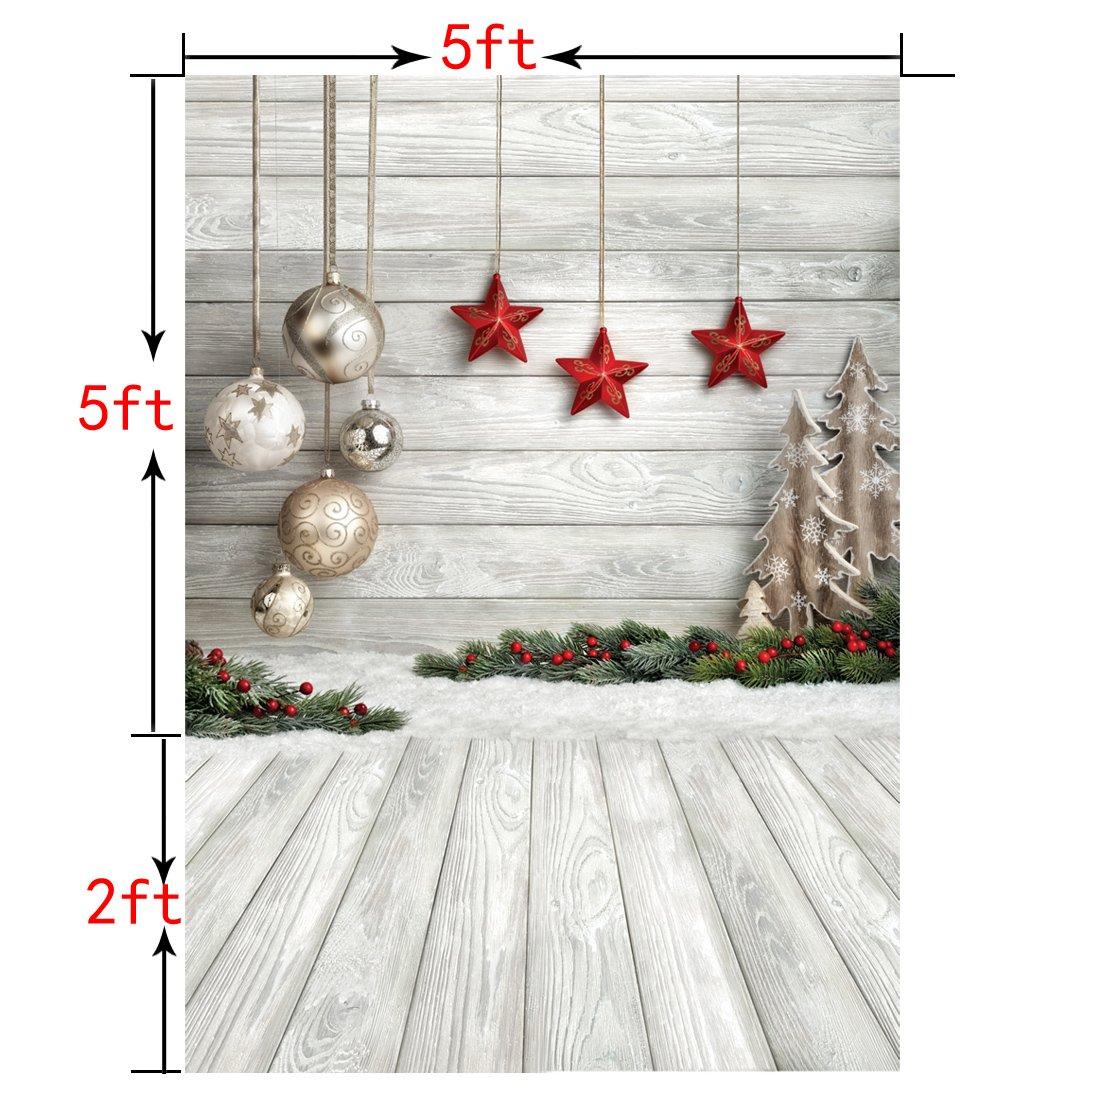 Amazon.com : SJOLOON 5X7ft Christmas Balls White Wood Floor ...